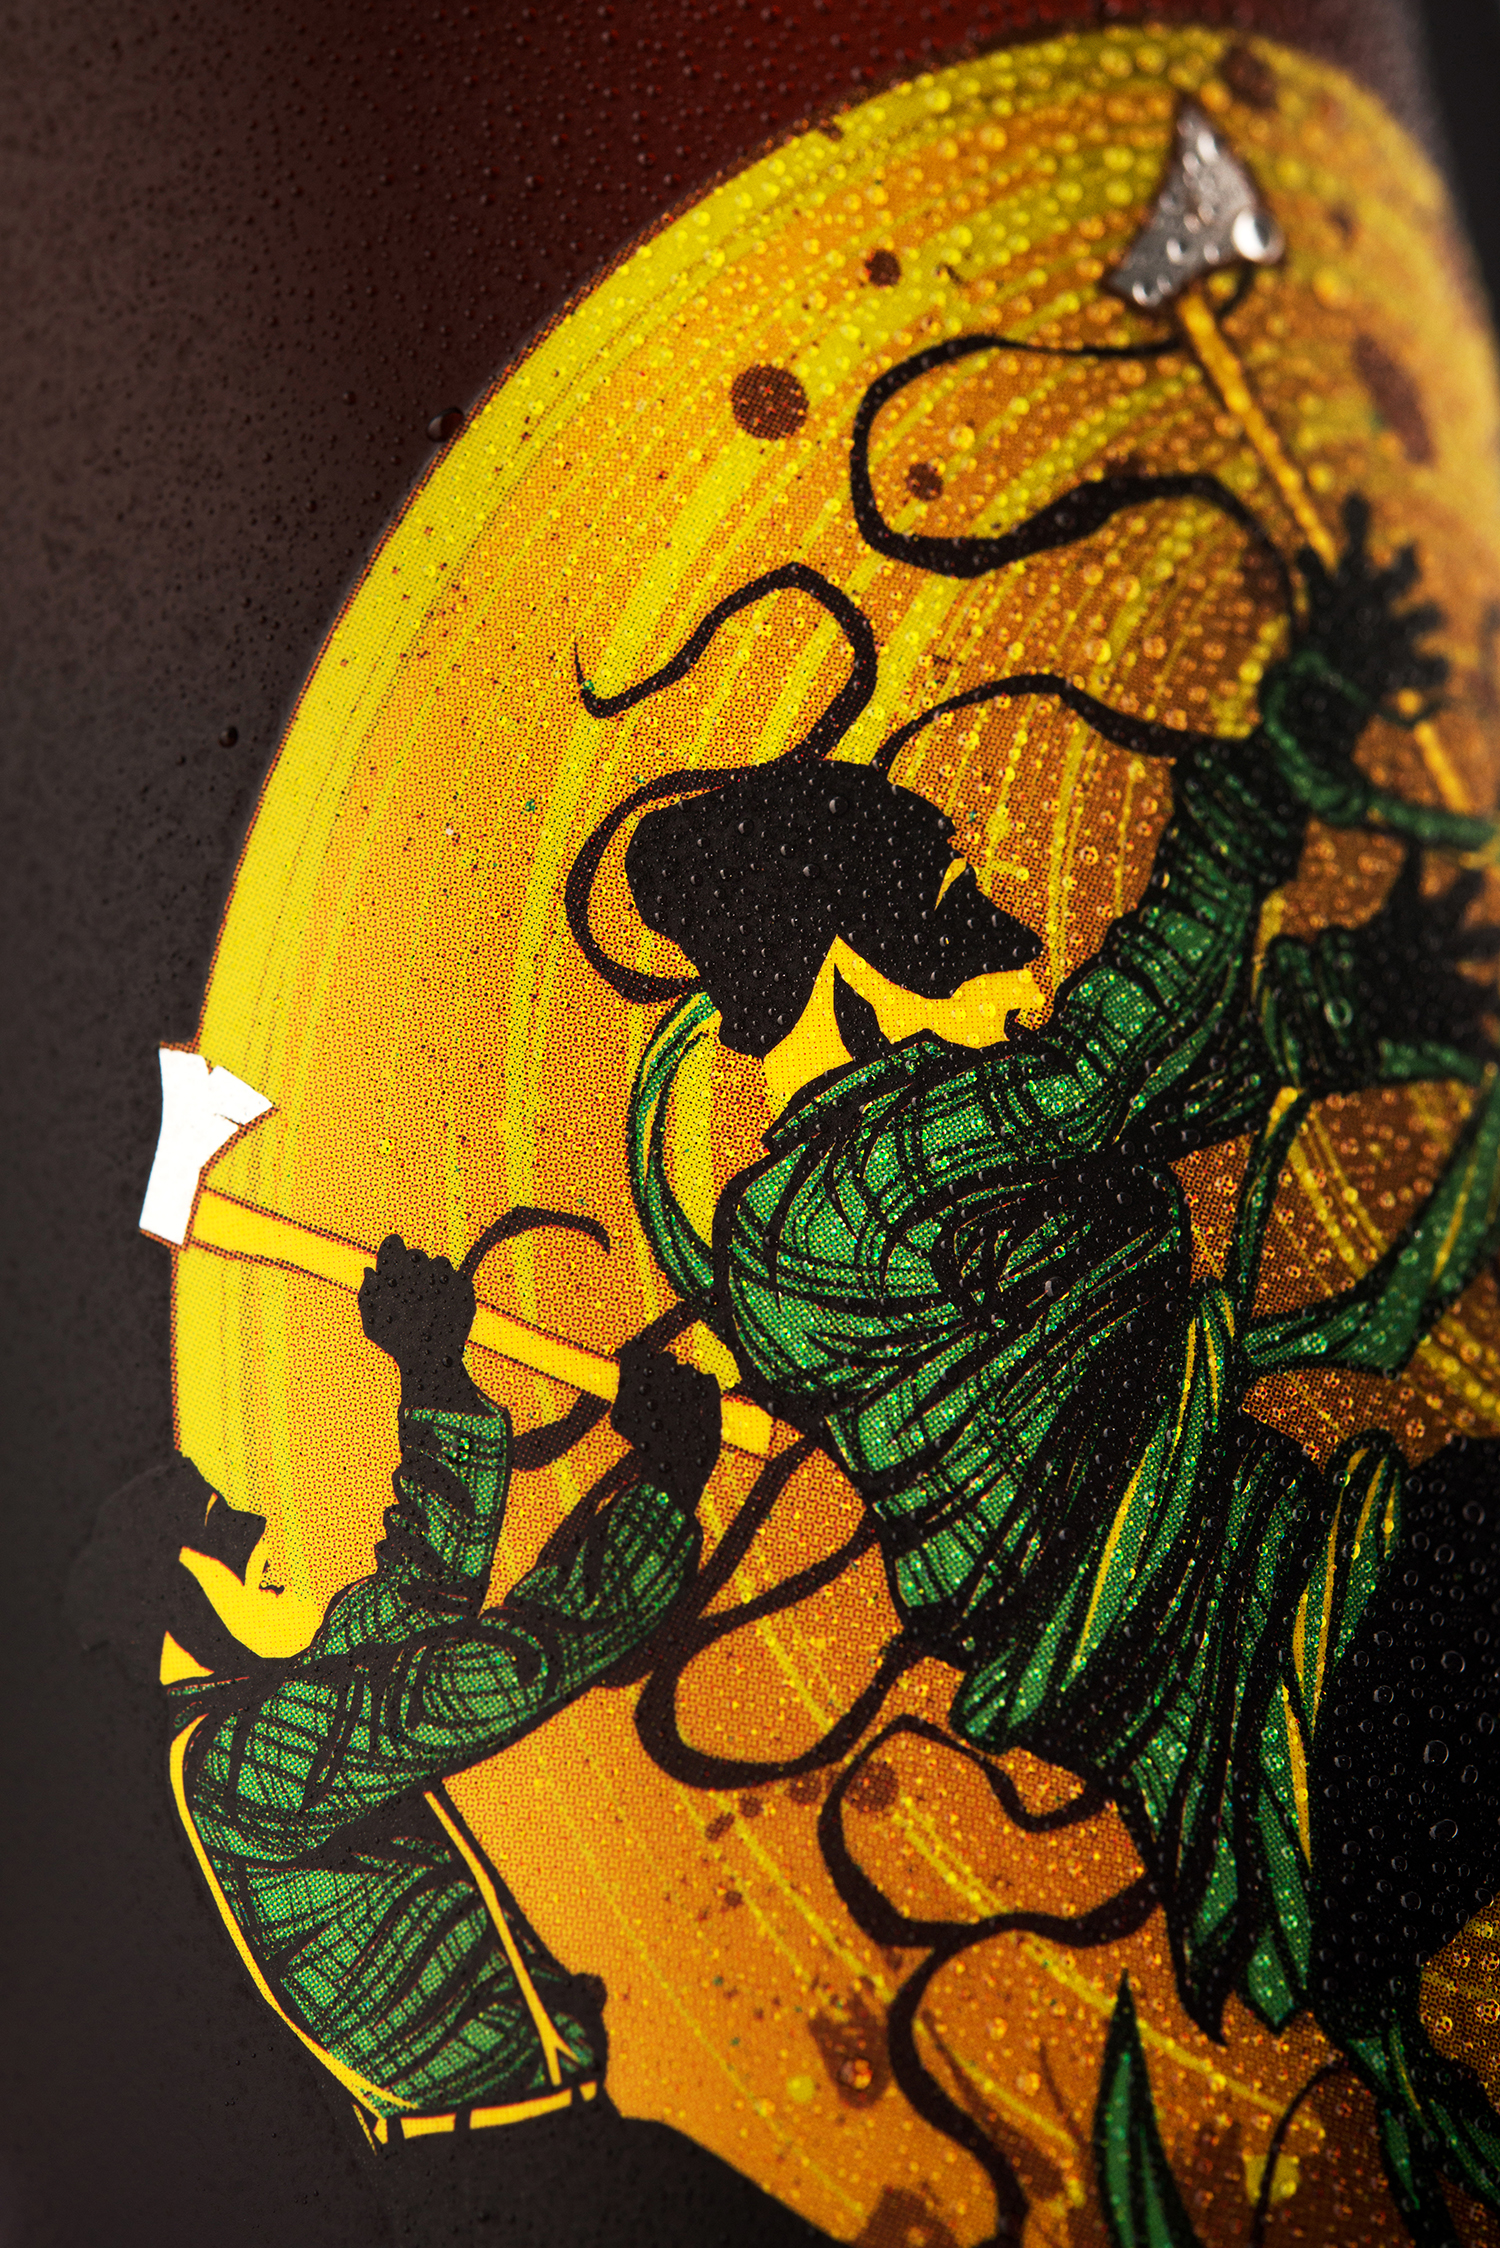 Packaging Design for Driftwood Brewery's Limb From Limb RyePa